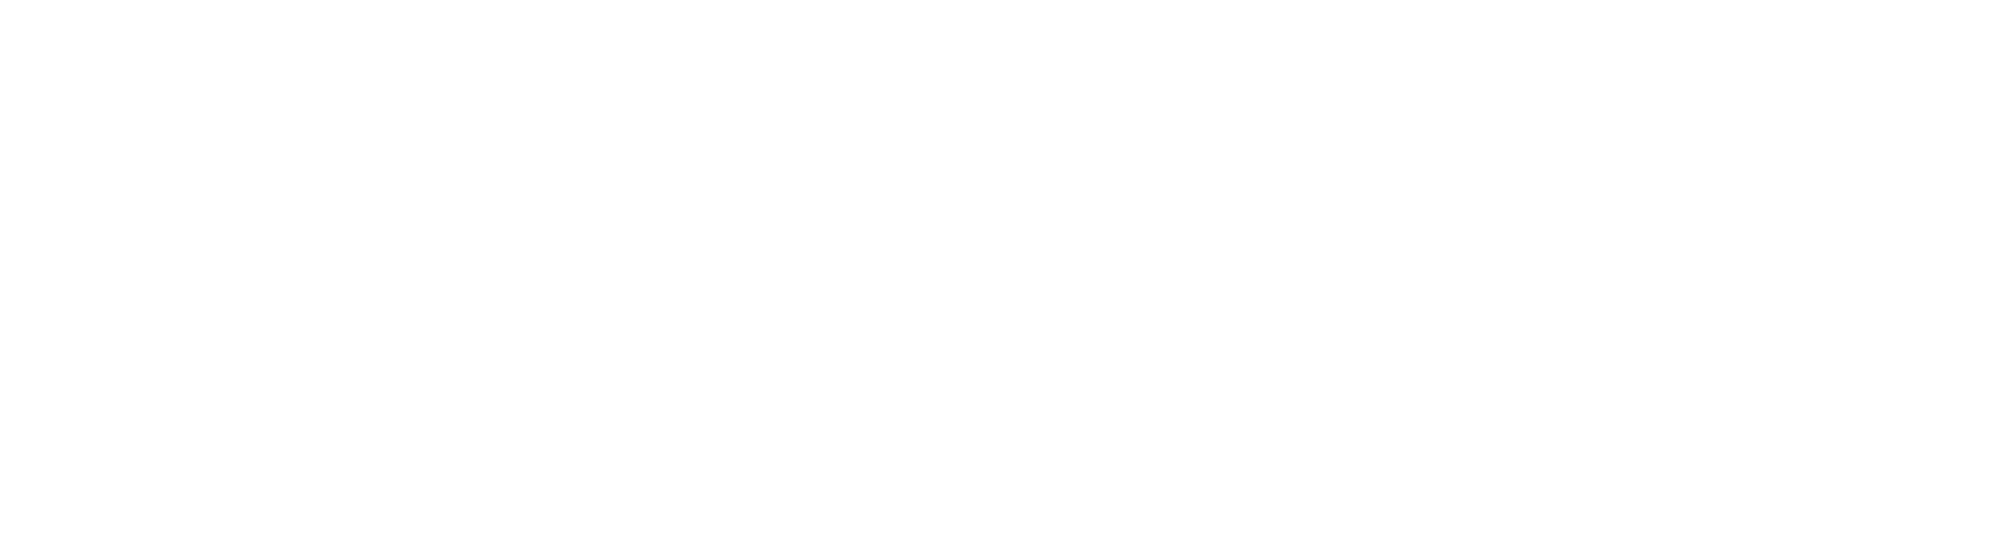 sub-head-blank